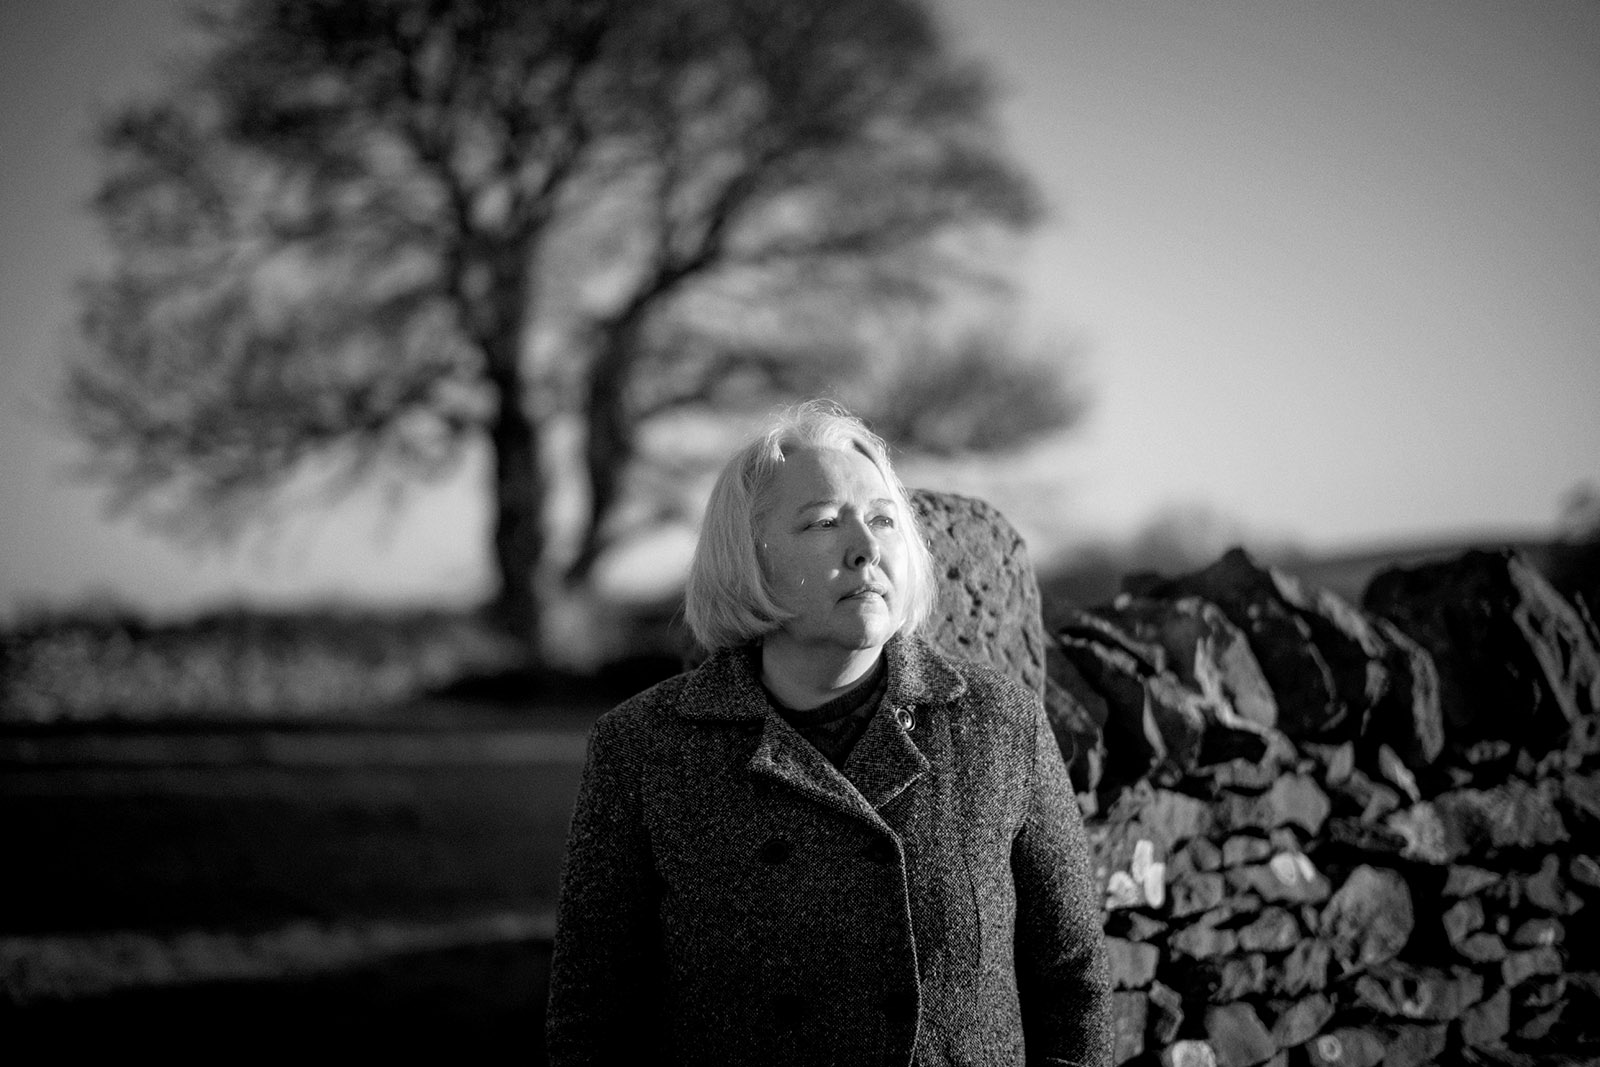 Susanna Clarke, Derbyshire, England